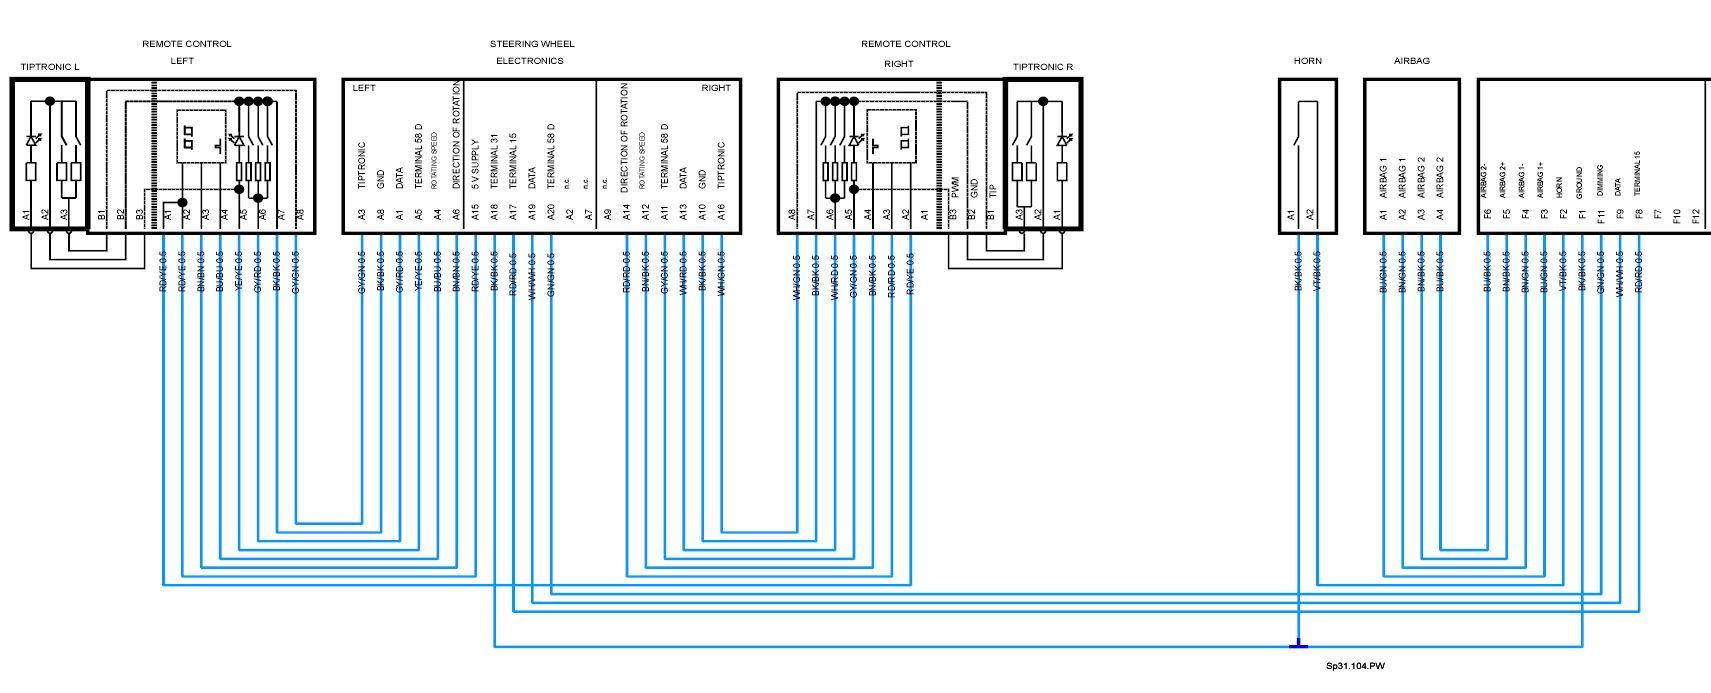 86 Toyota Mr2 Belt Diagram Guide And Troubleshooting Of Wiring For 1985 Lamborghini Gallardo Diagrams Urraco 1986 Silver